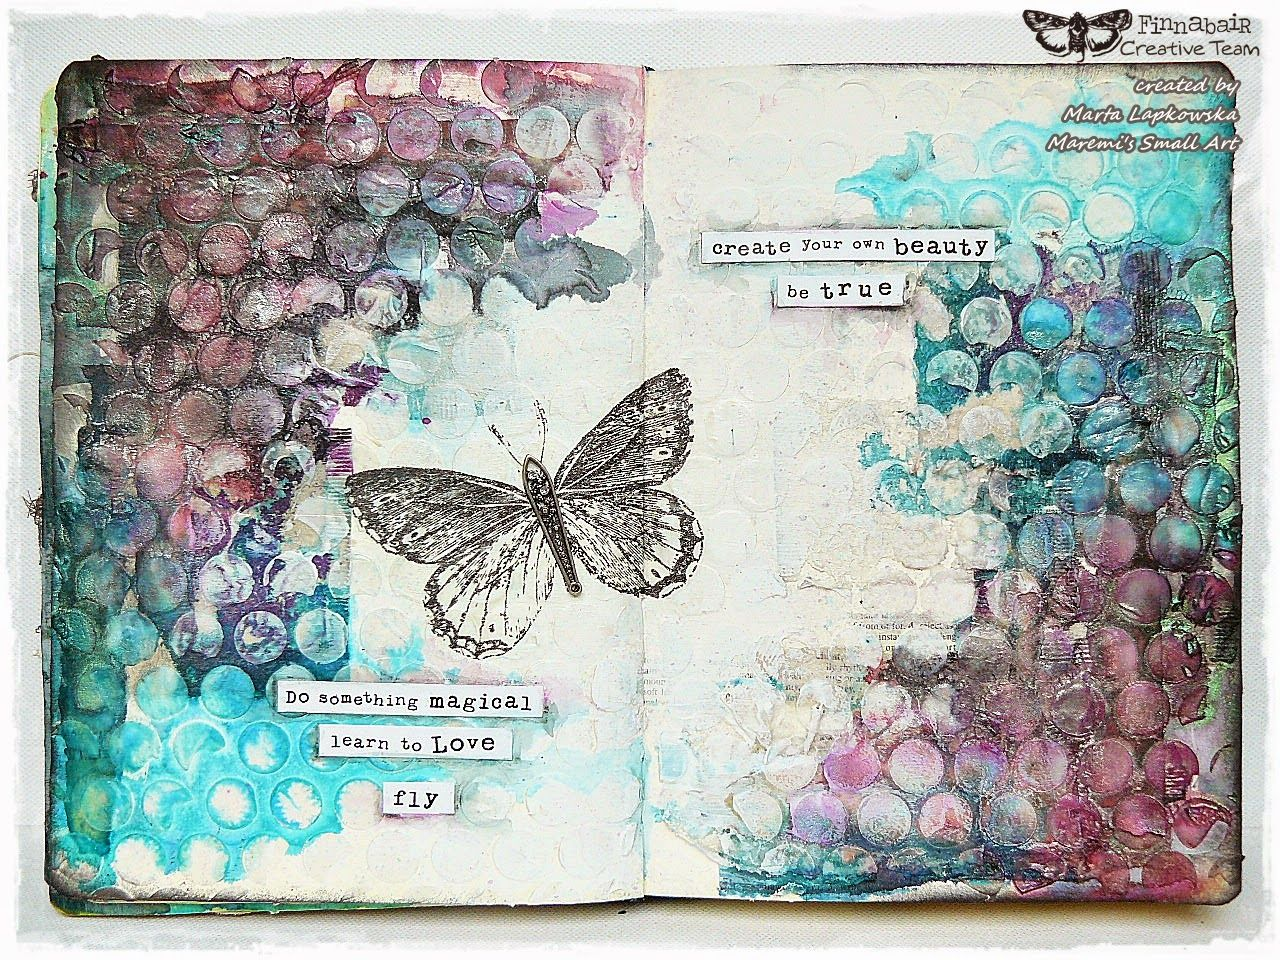 http://artistycrafty.blogspot.ie/2015/02/learn-to-love-journal-page-video.html